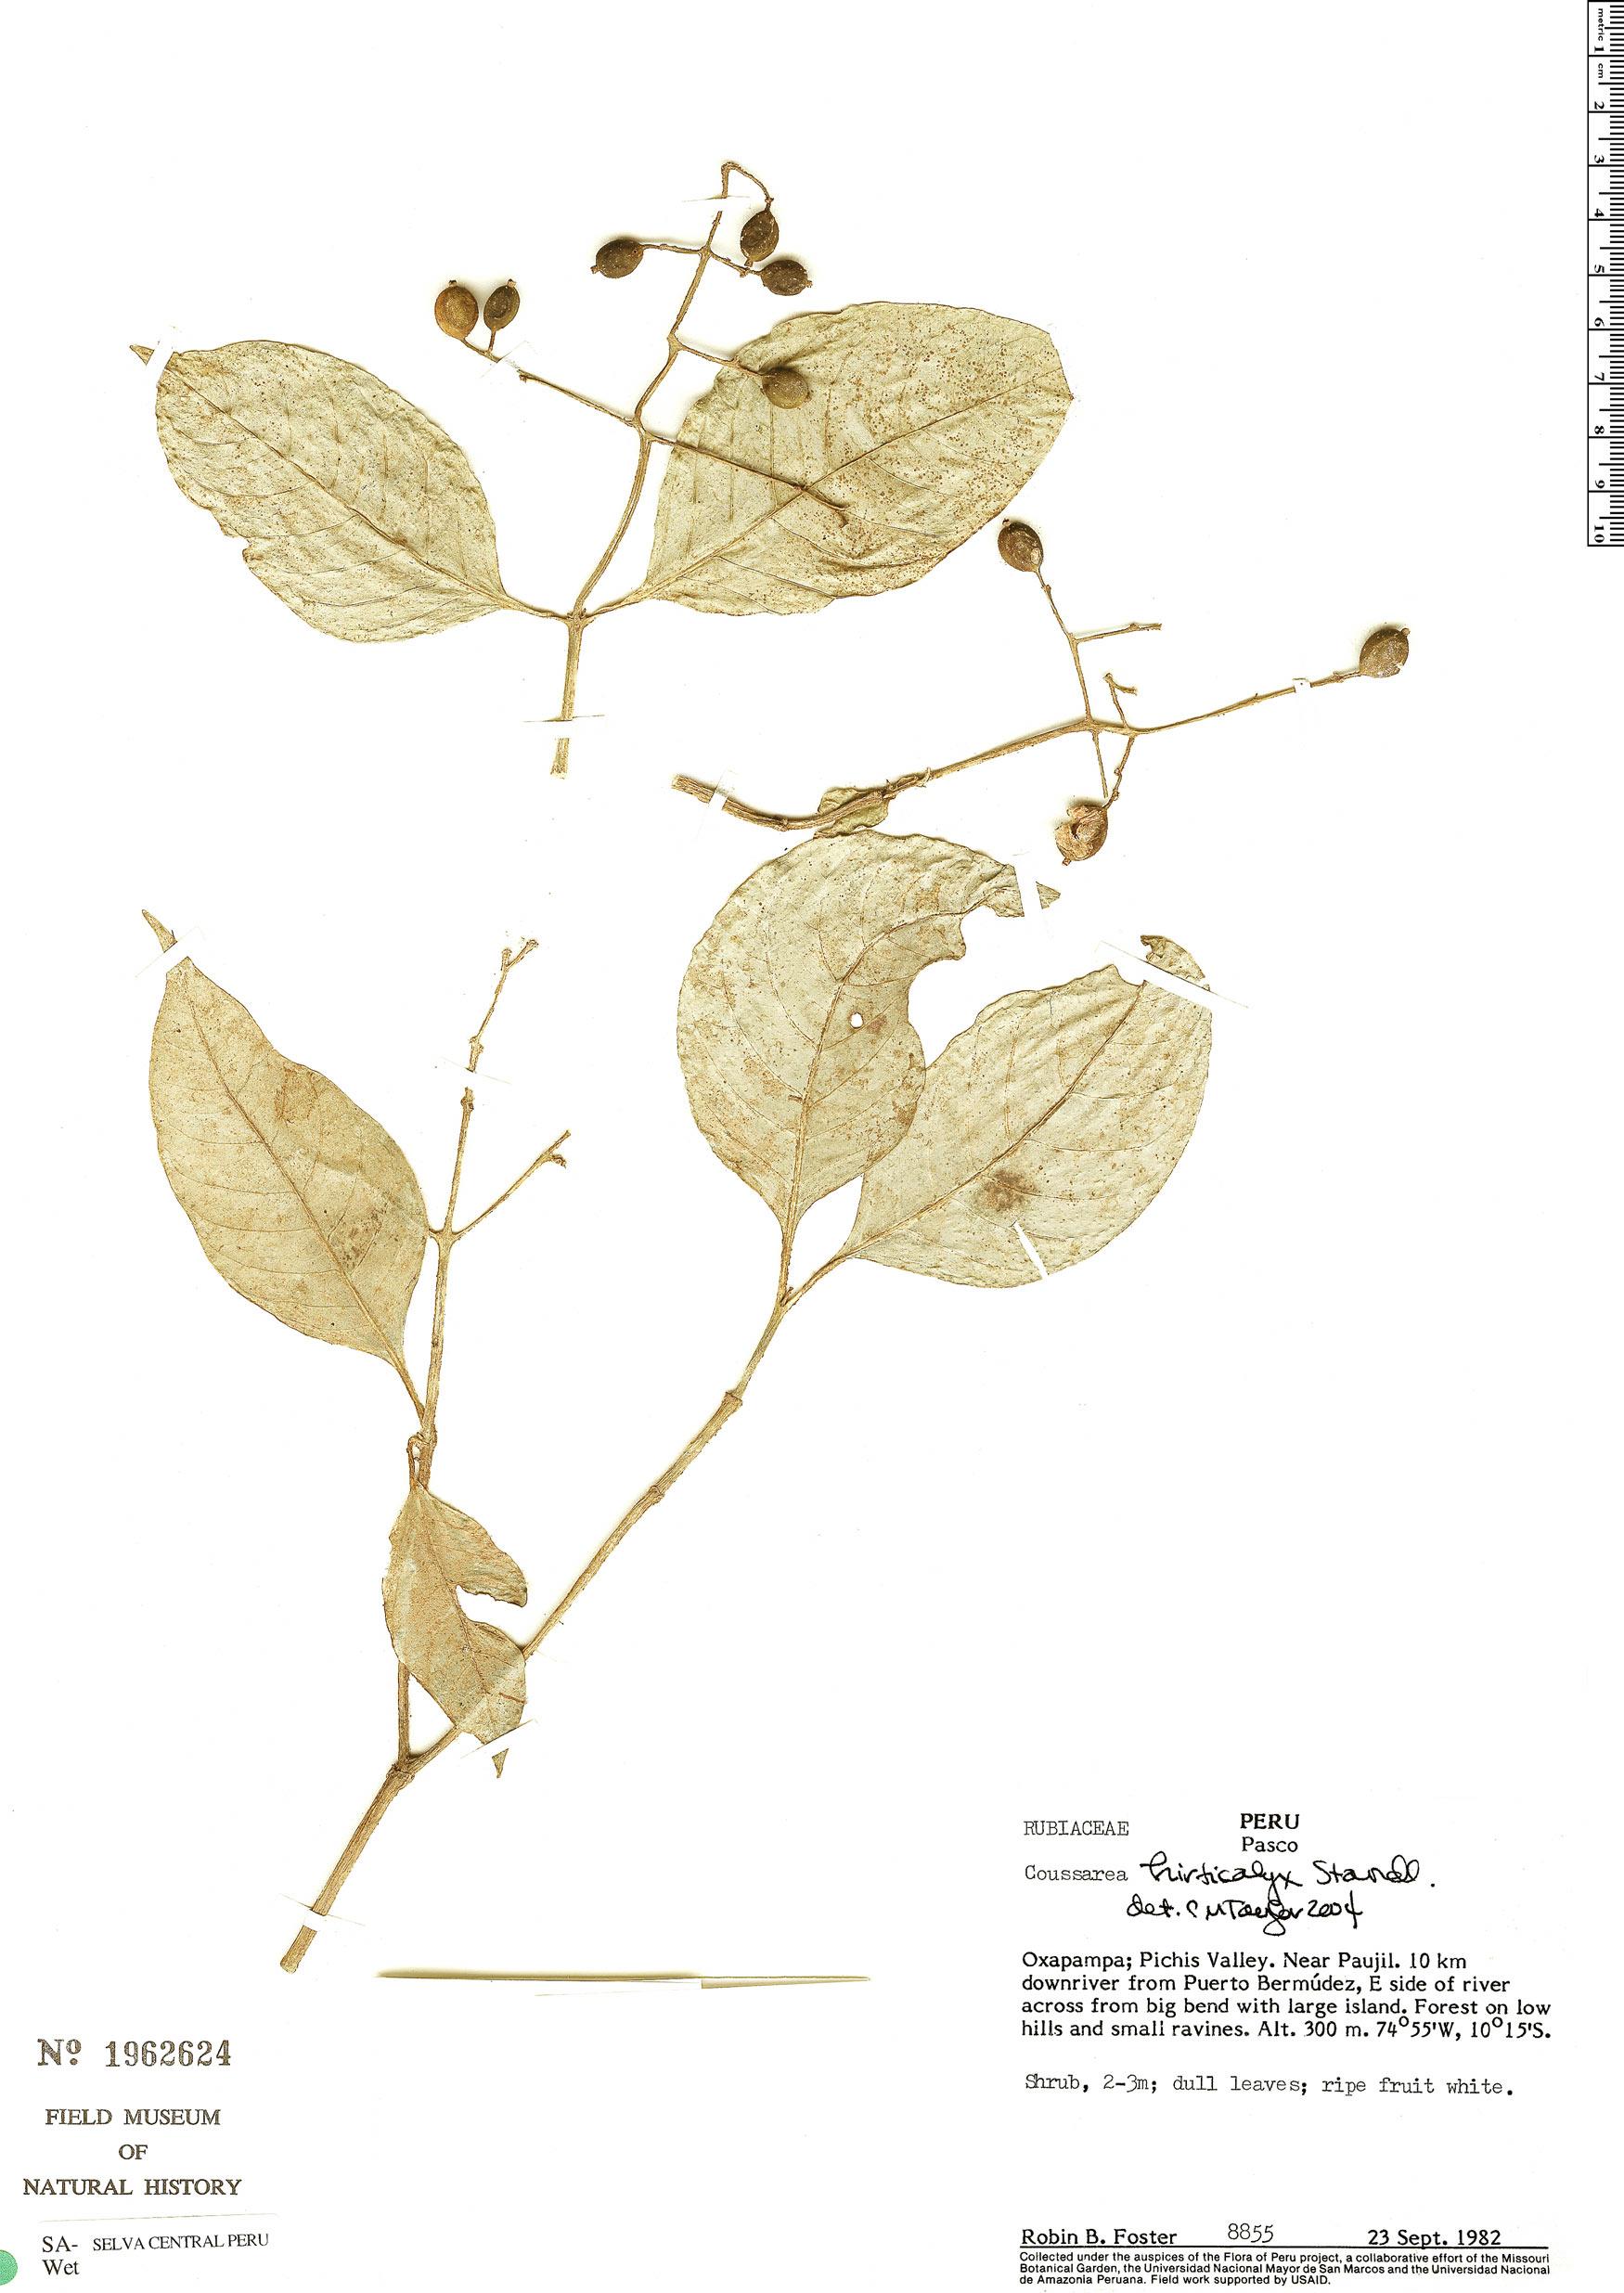 Specimen: Coussarea hirticalyx